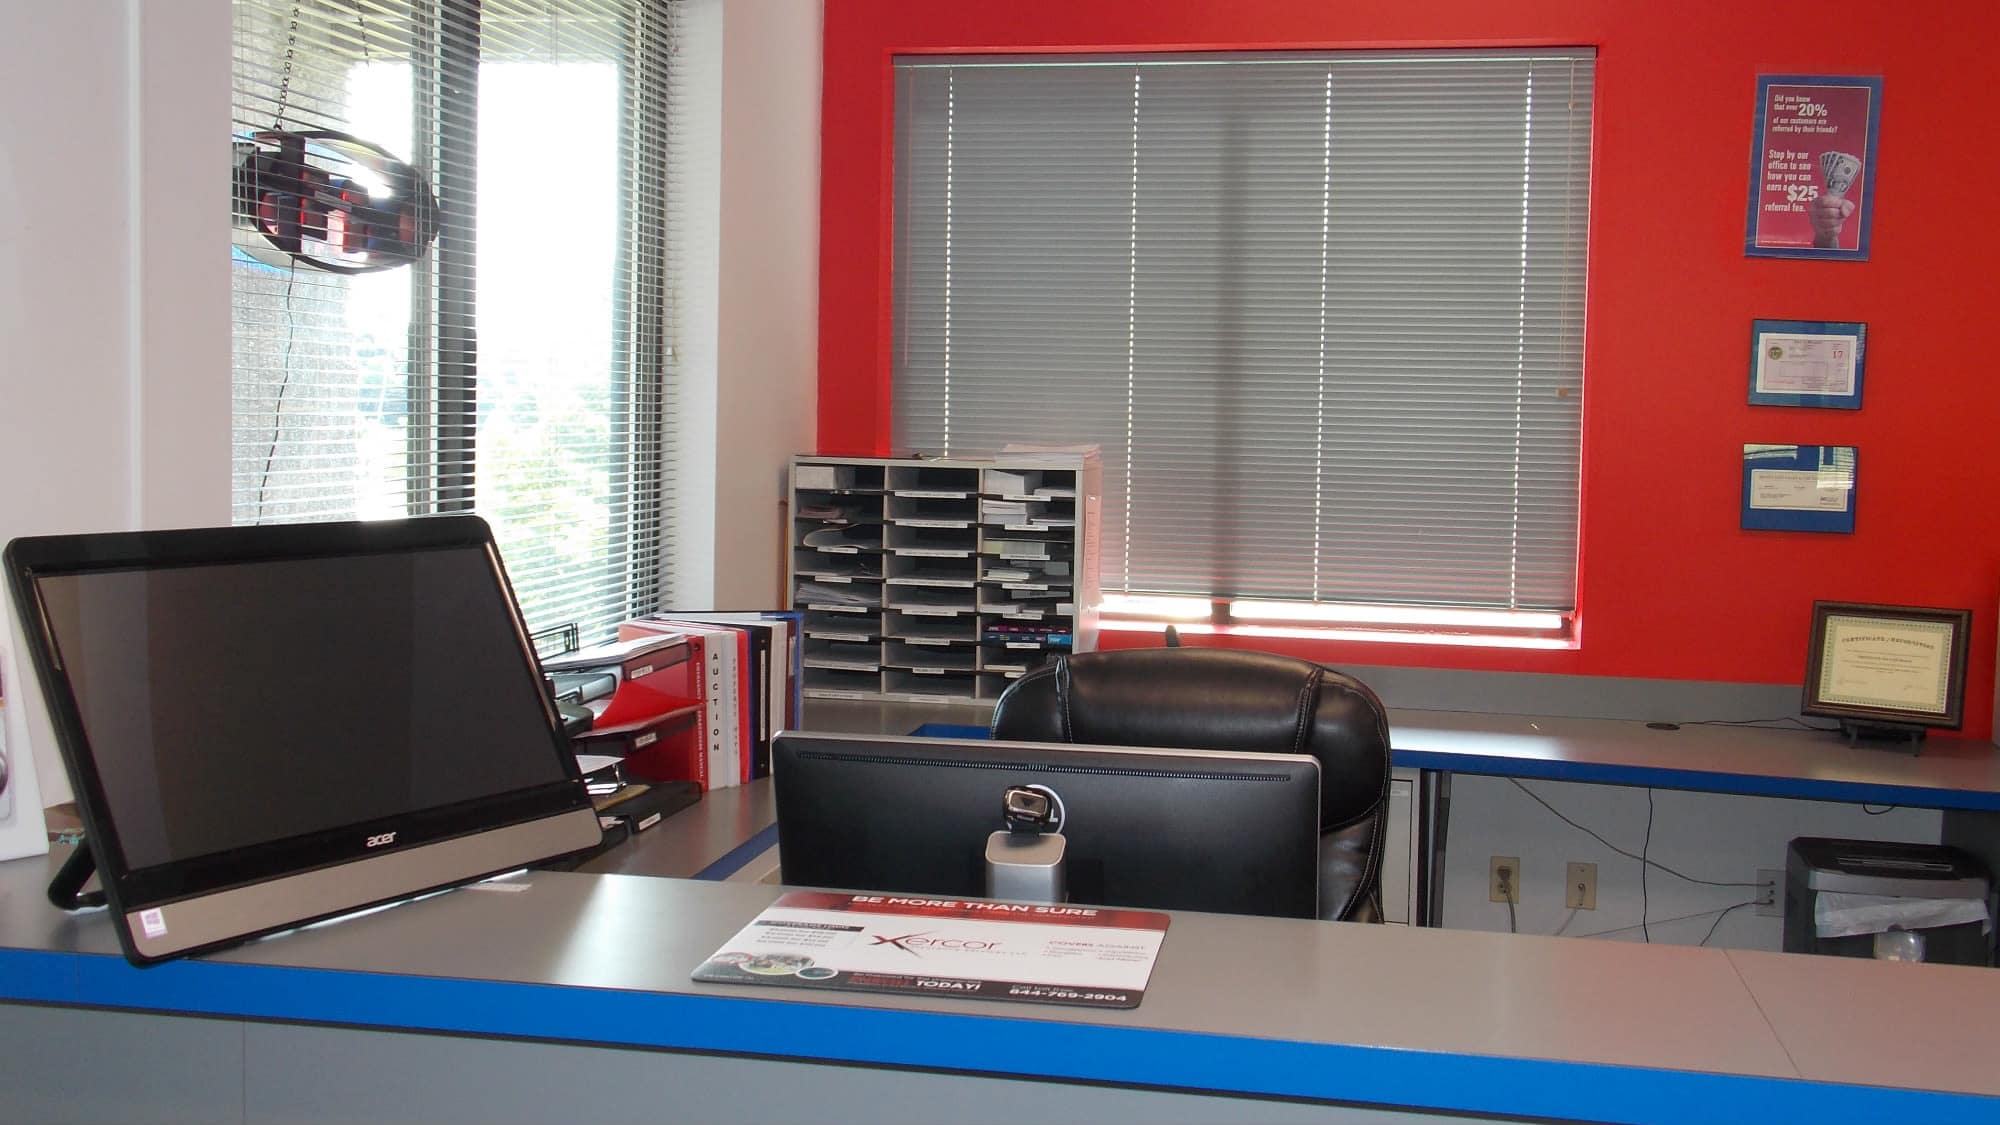 Leasing desk at Freestate Self Storage in Laurel, Maryland